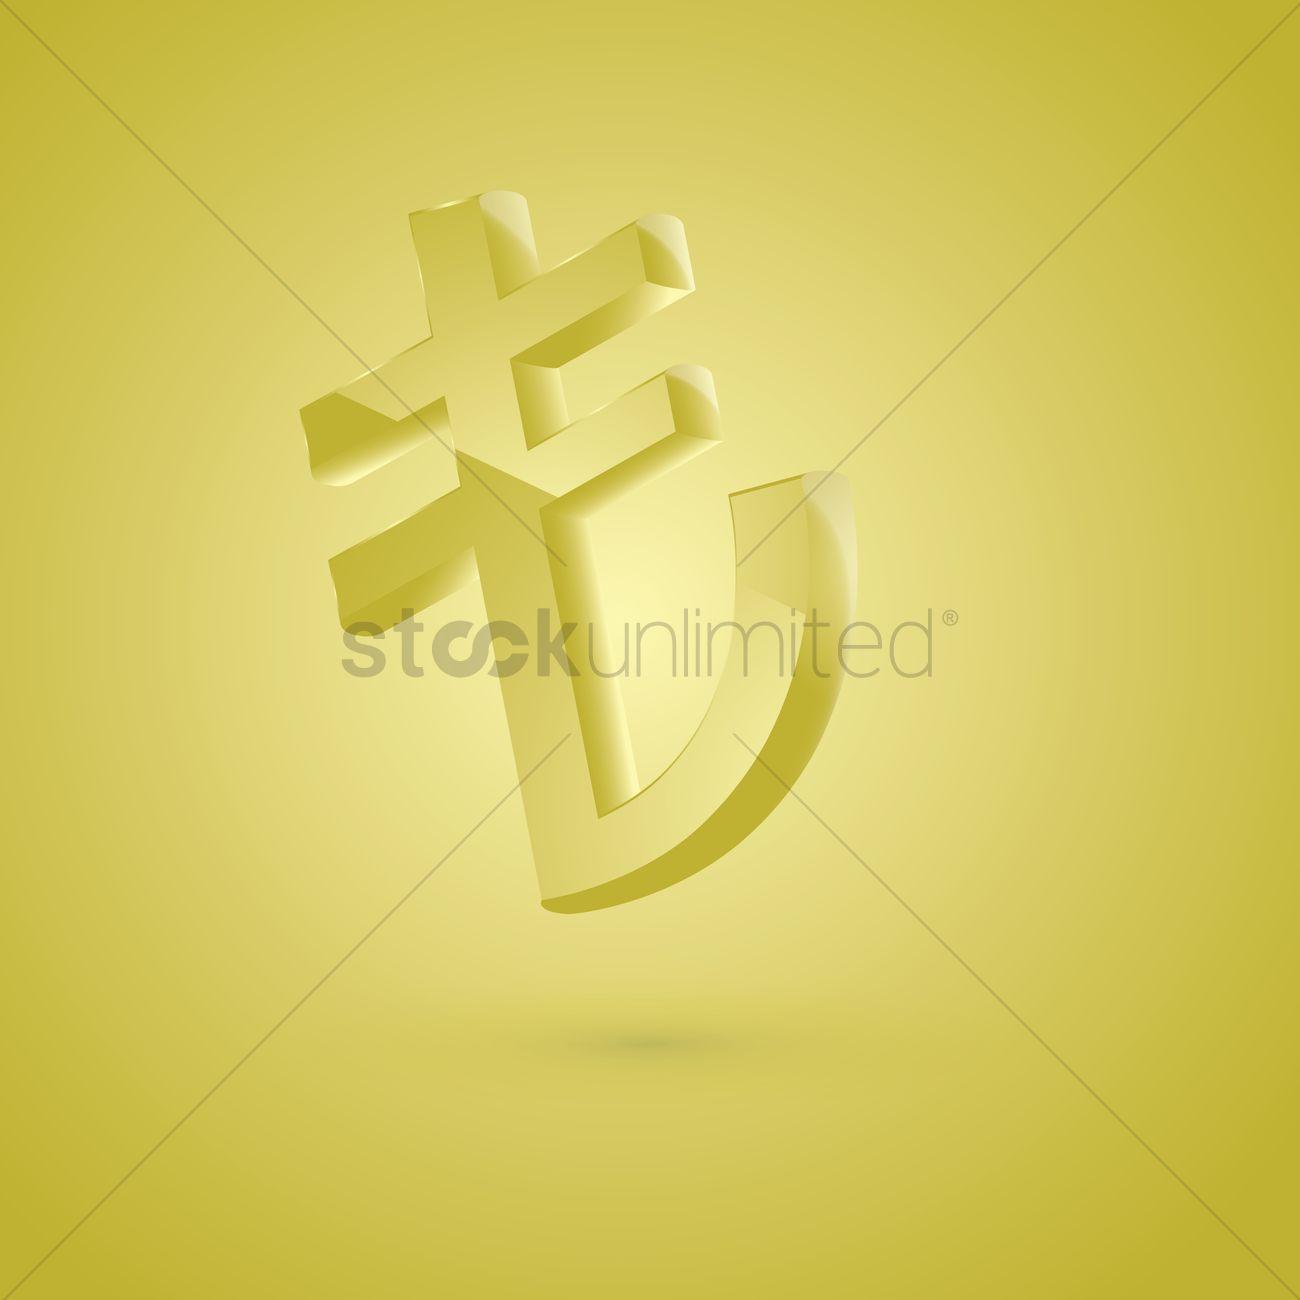 Turkey lira currency symbol vector image 1607352 stockunlimited turkey lira currency symbol vector graphic buycottarizona